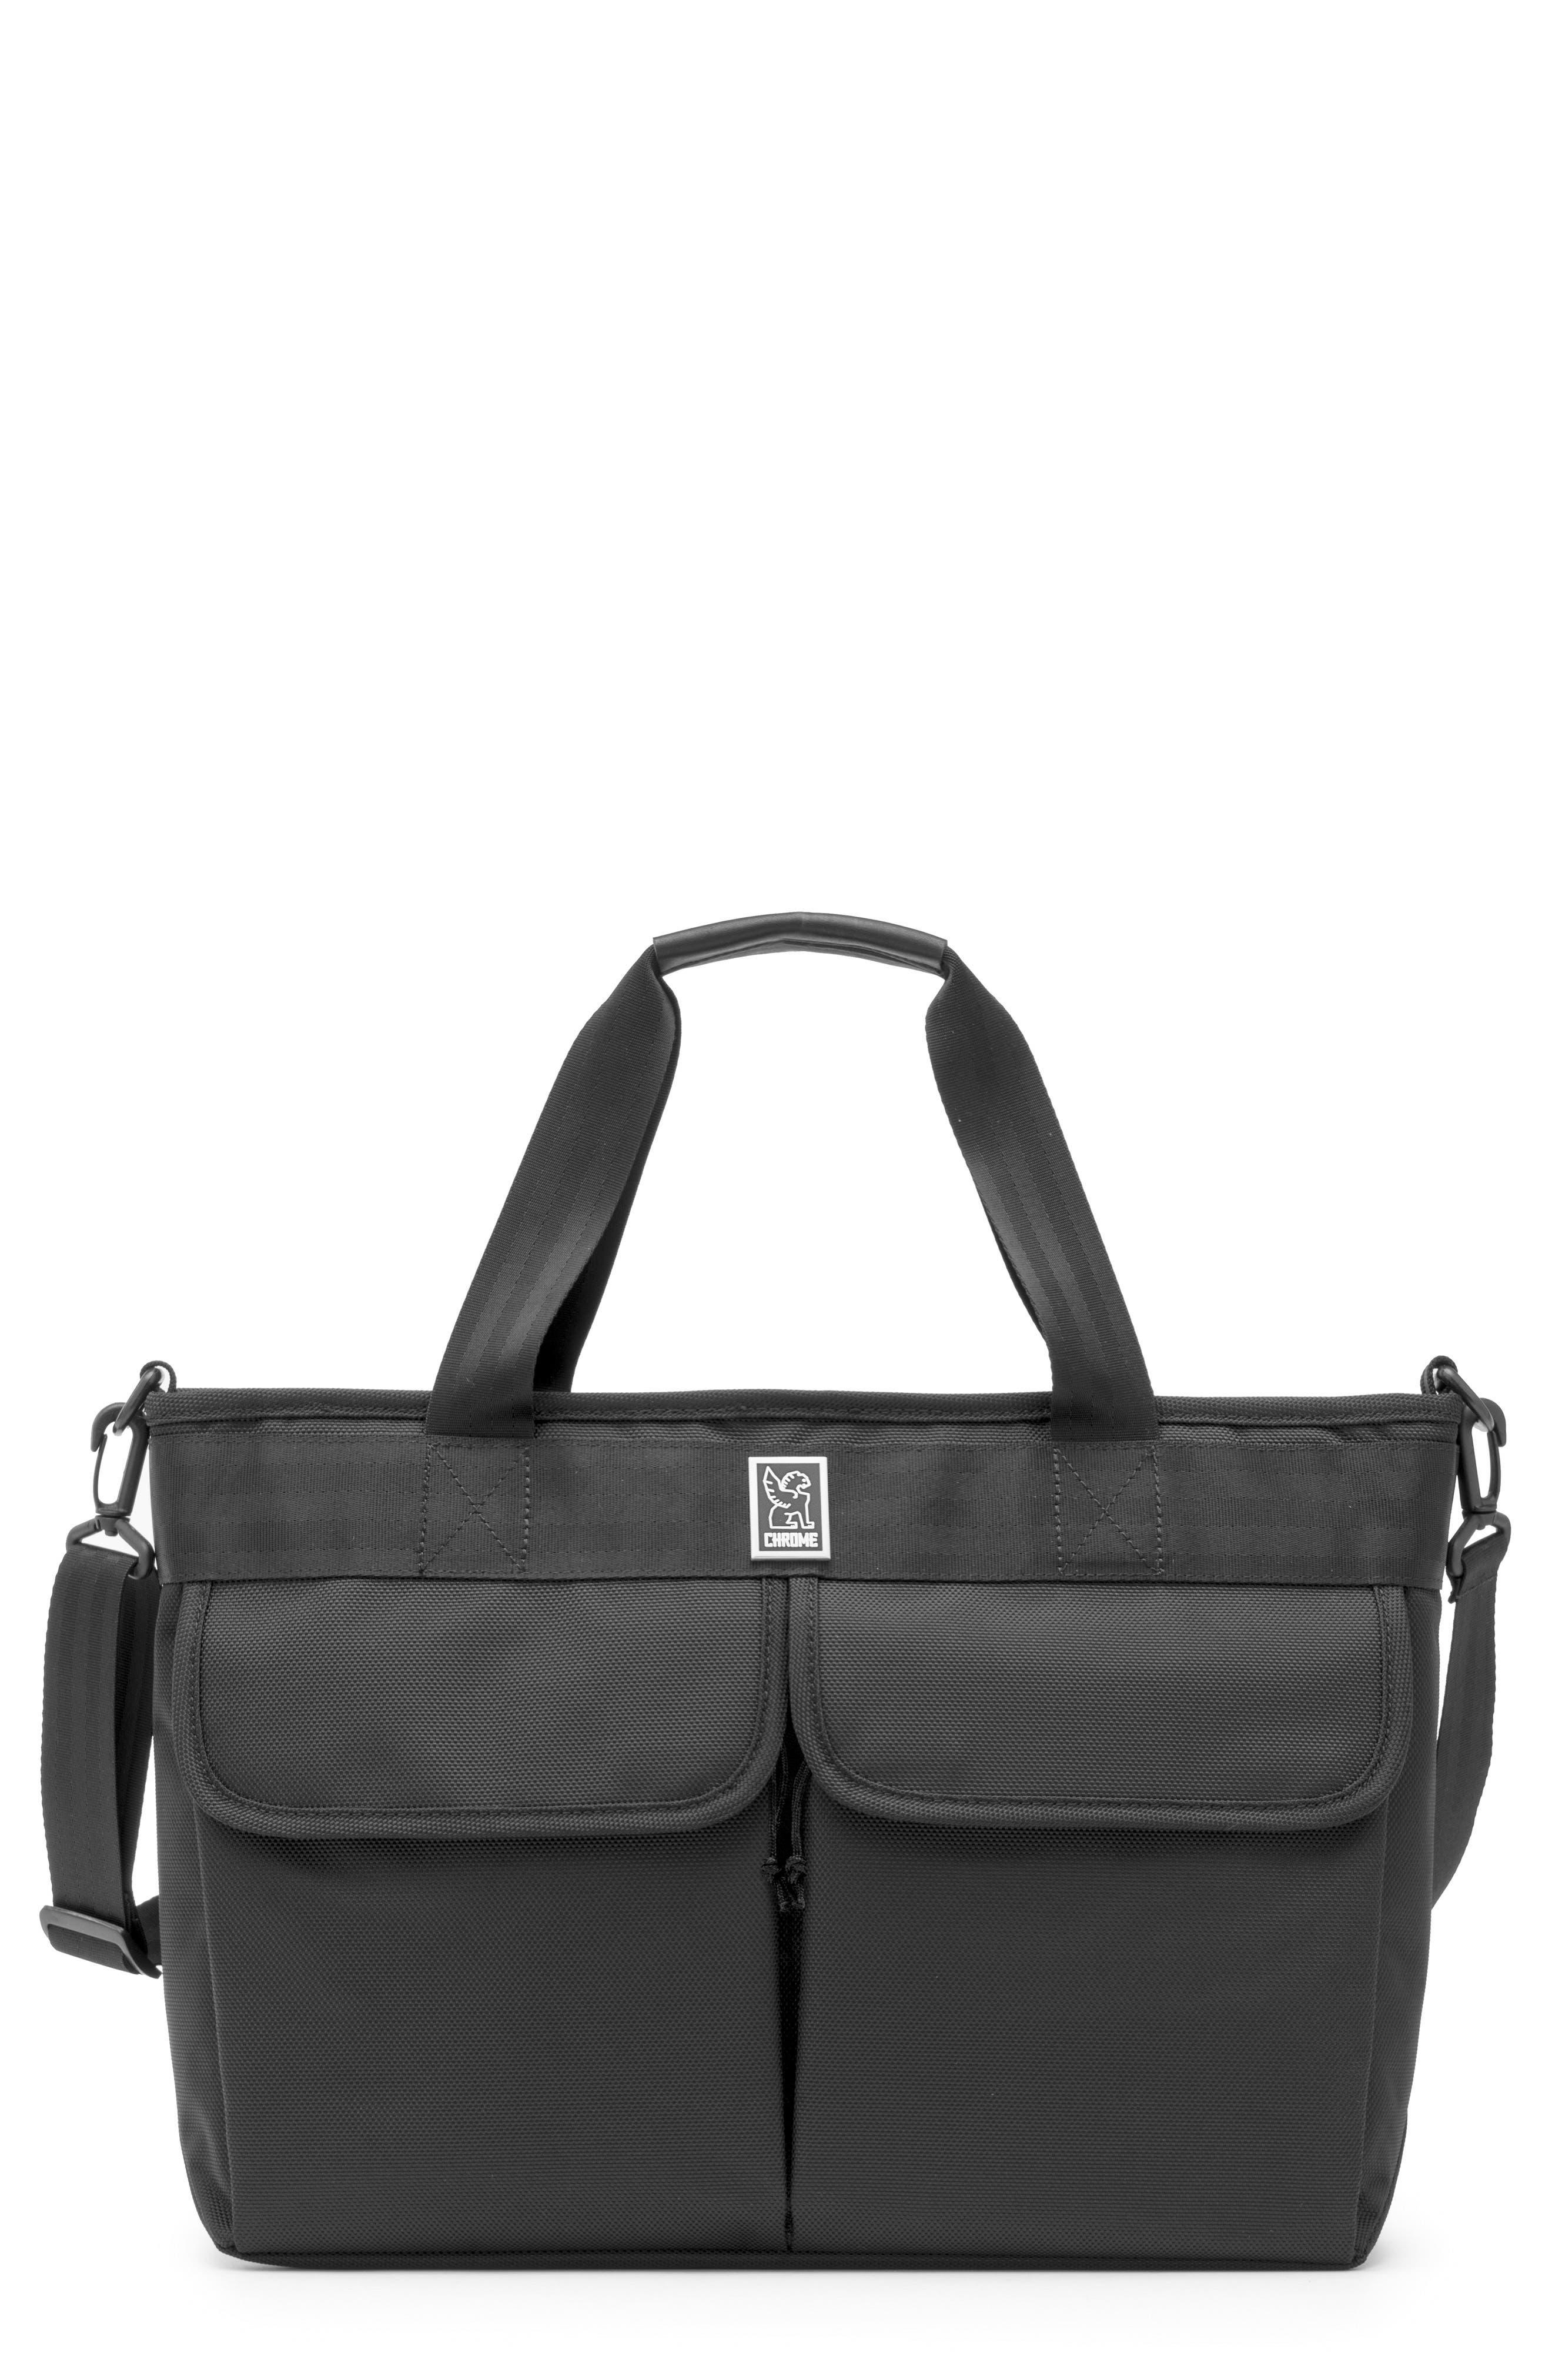 Juno Travel Tote Bag,                         Main,                         color, All Black